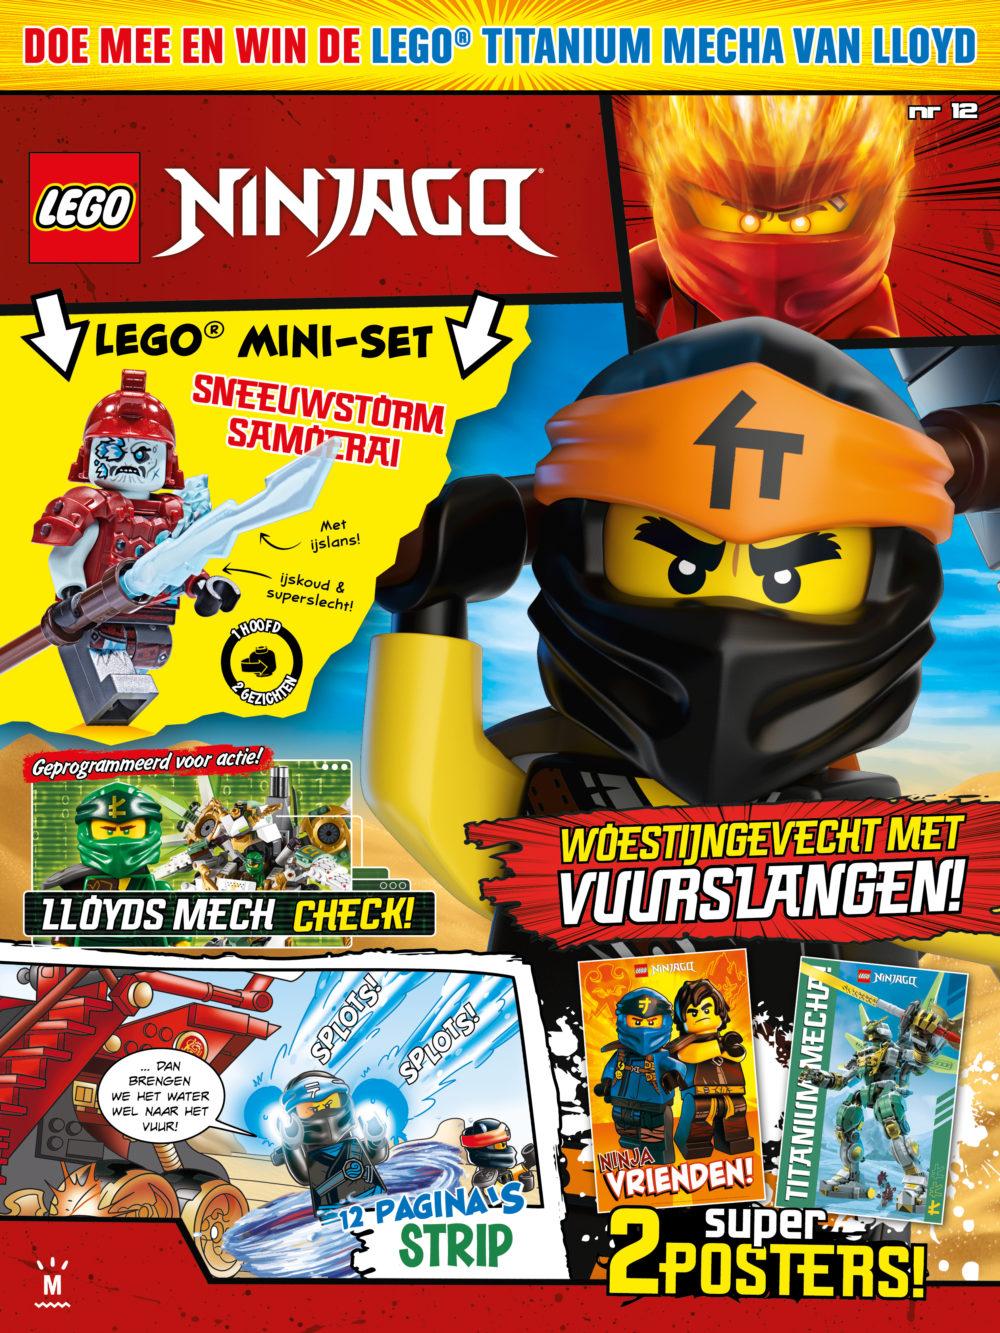 LEGO NINJAGO Magazine 12 2019